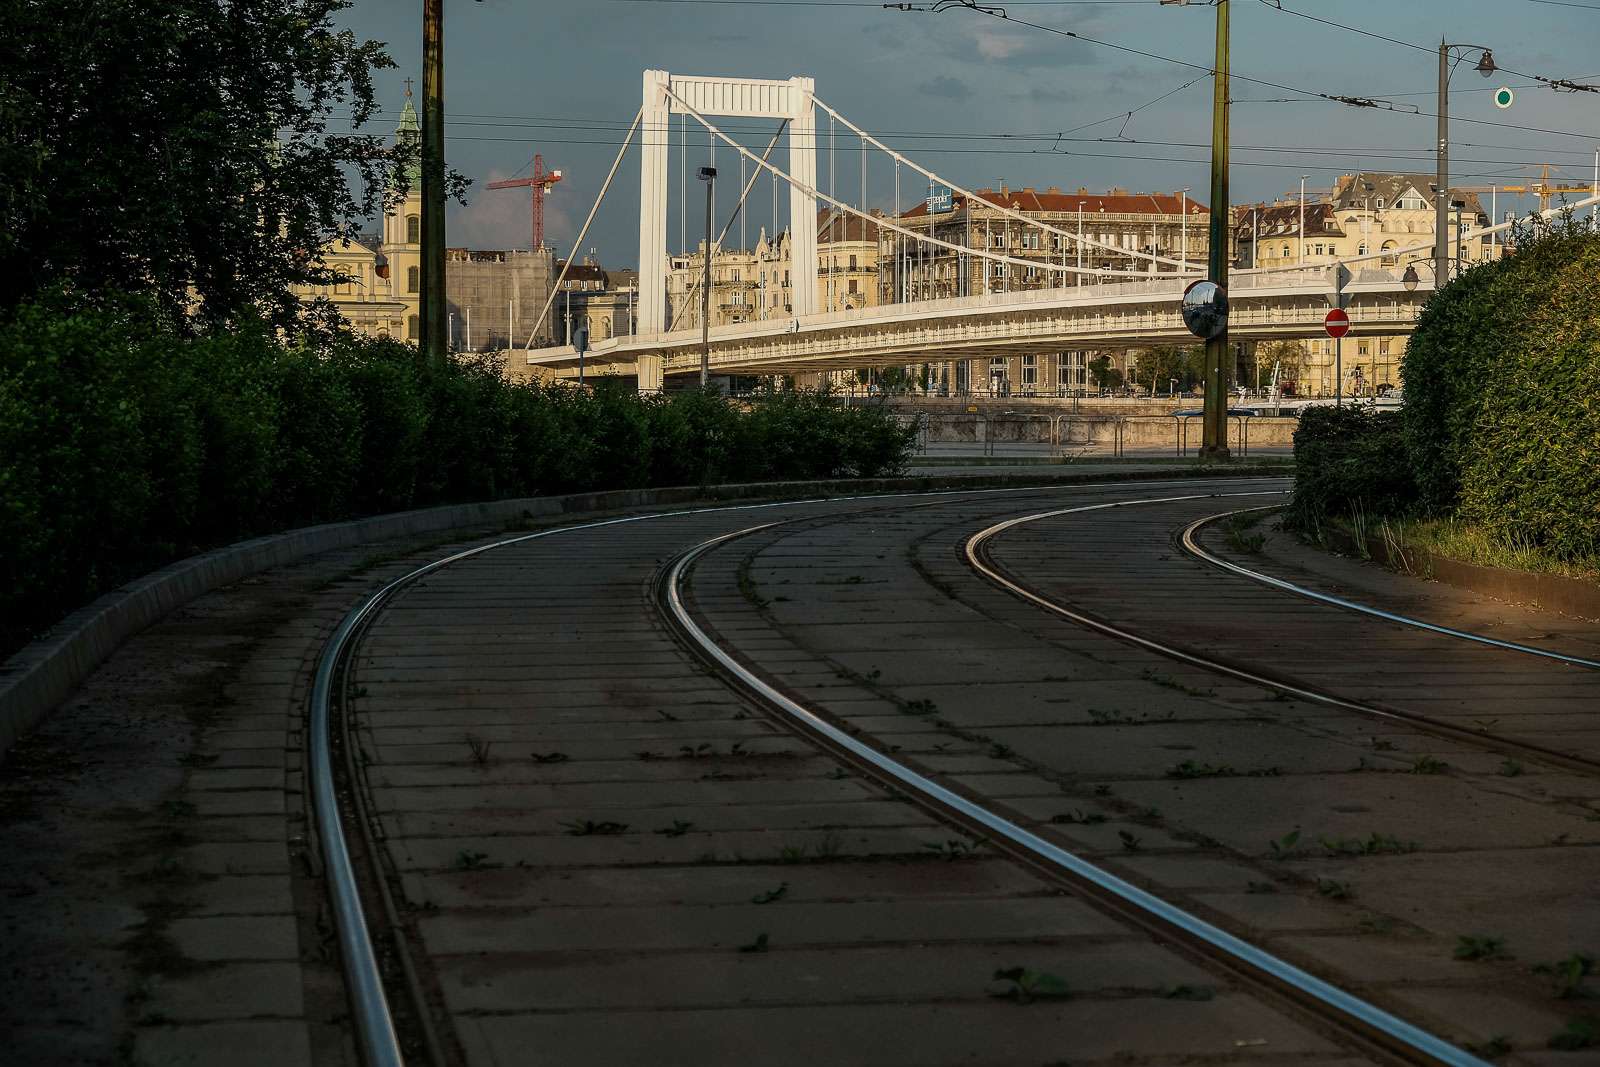 budapest-74.jpg